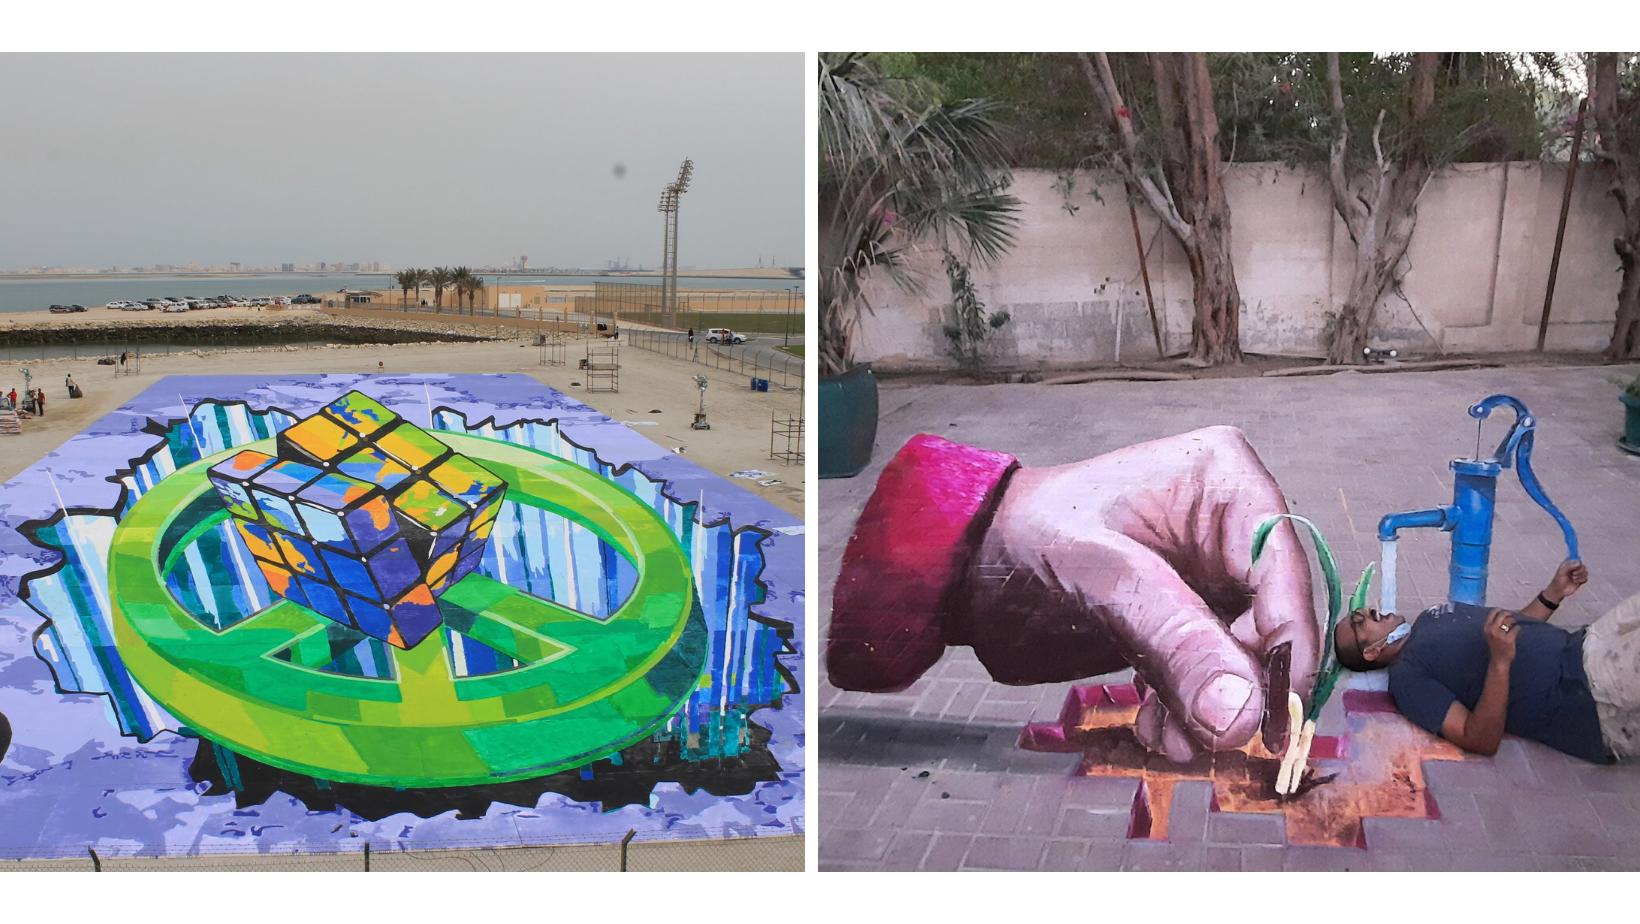 Chalk art World Record